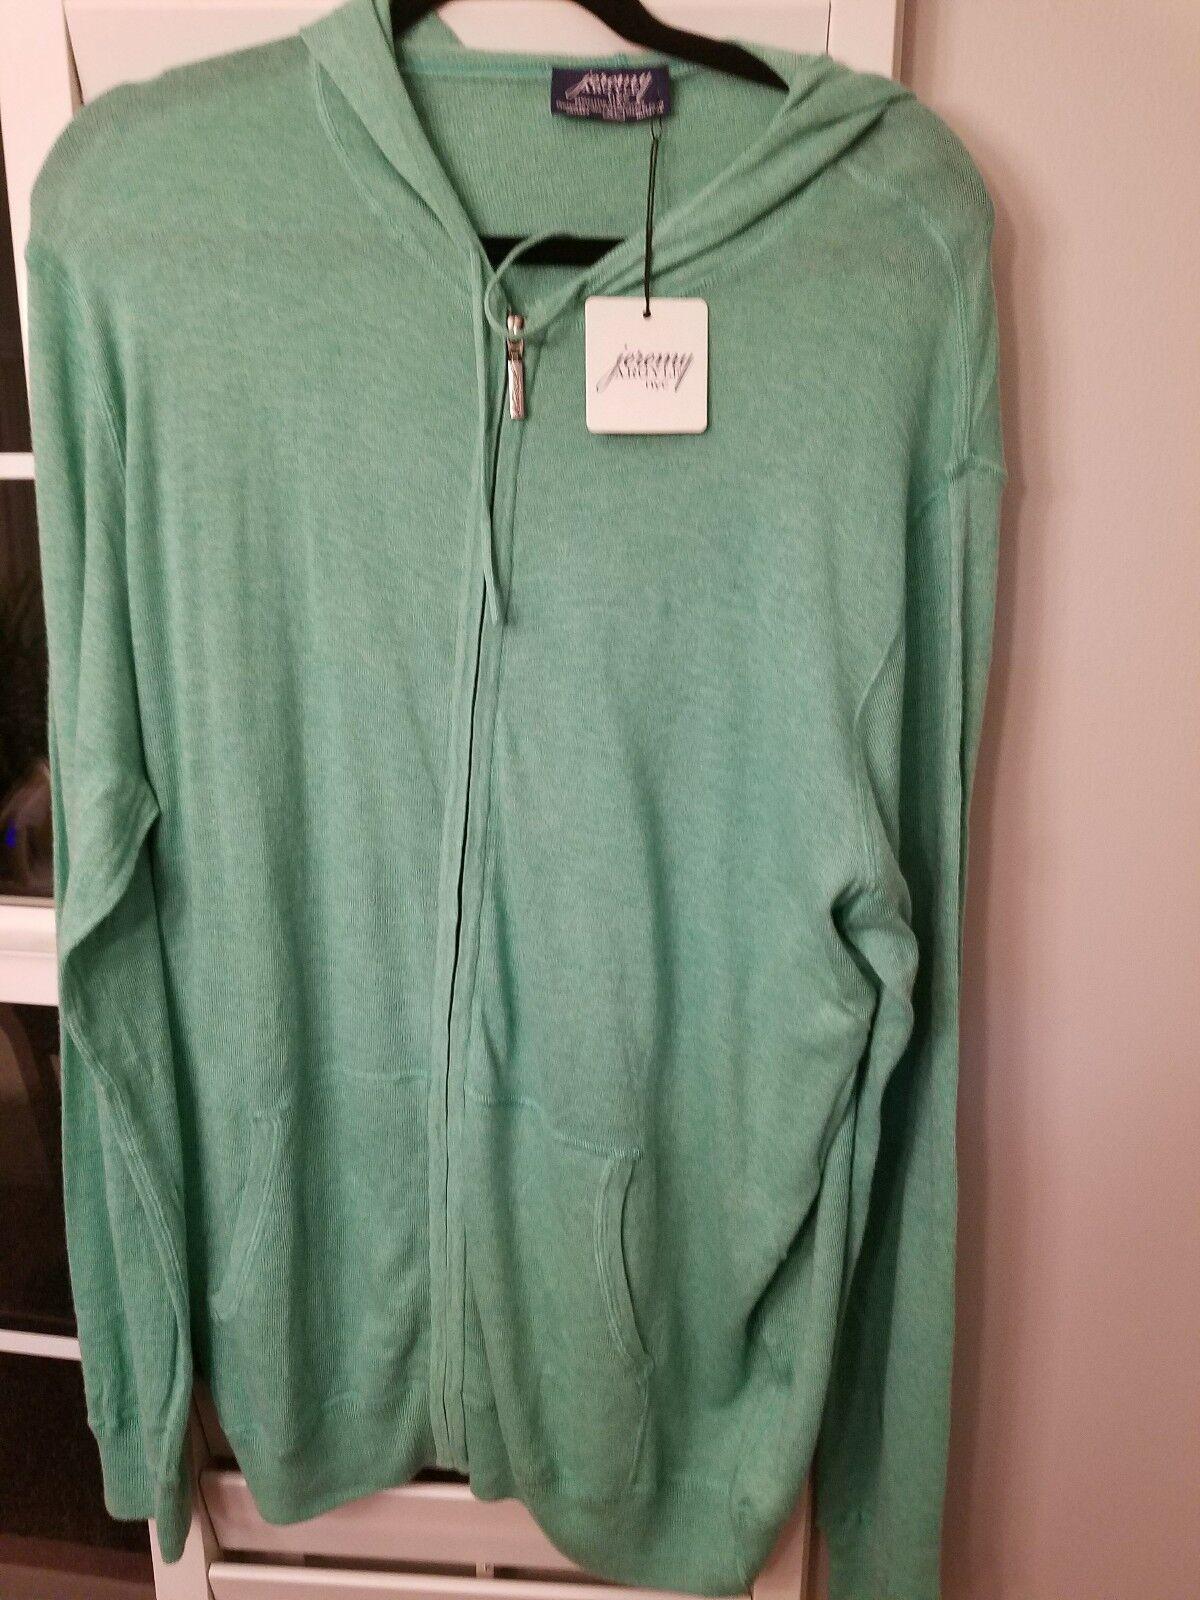 NWT Size XL Jeremy Argyle lightweight hoodie green JA12-green